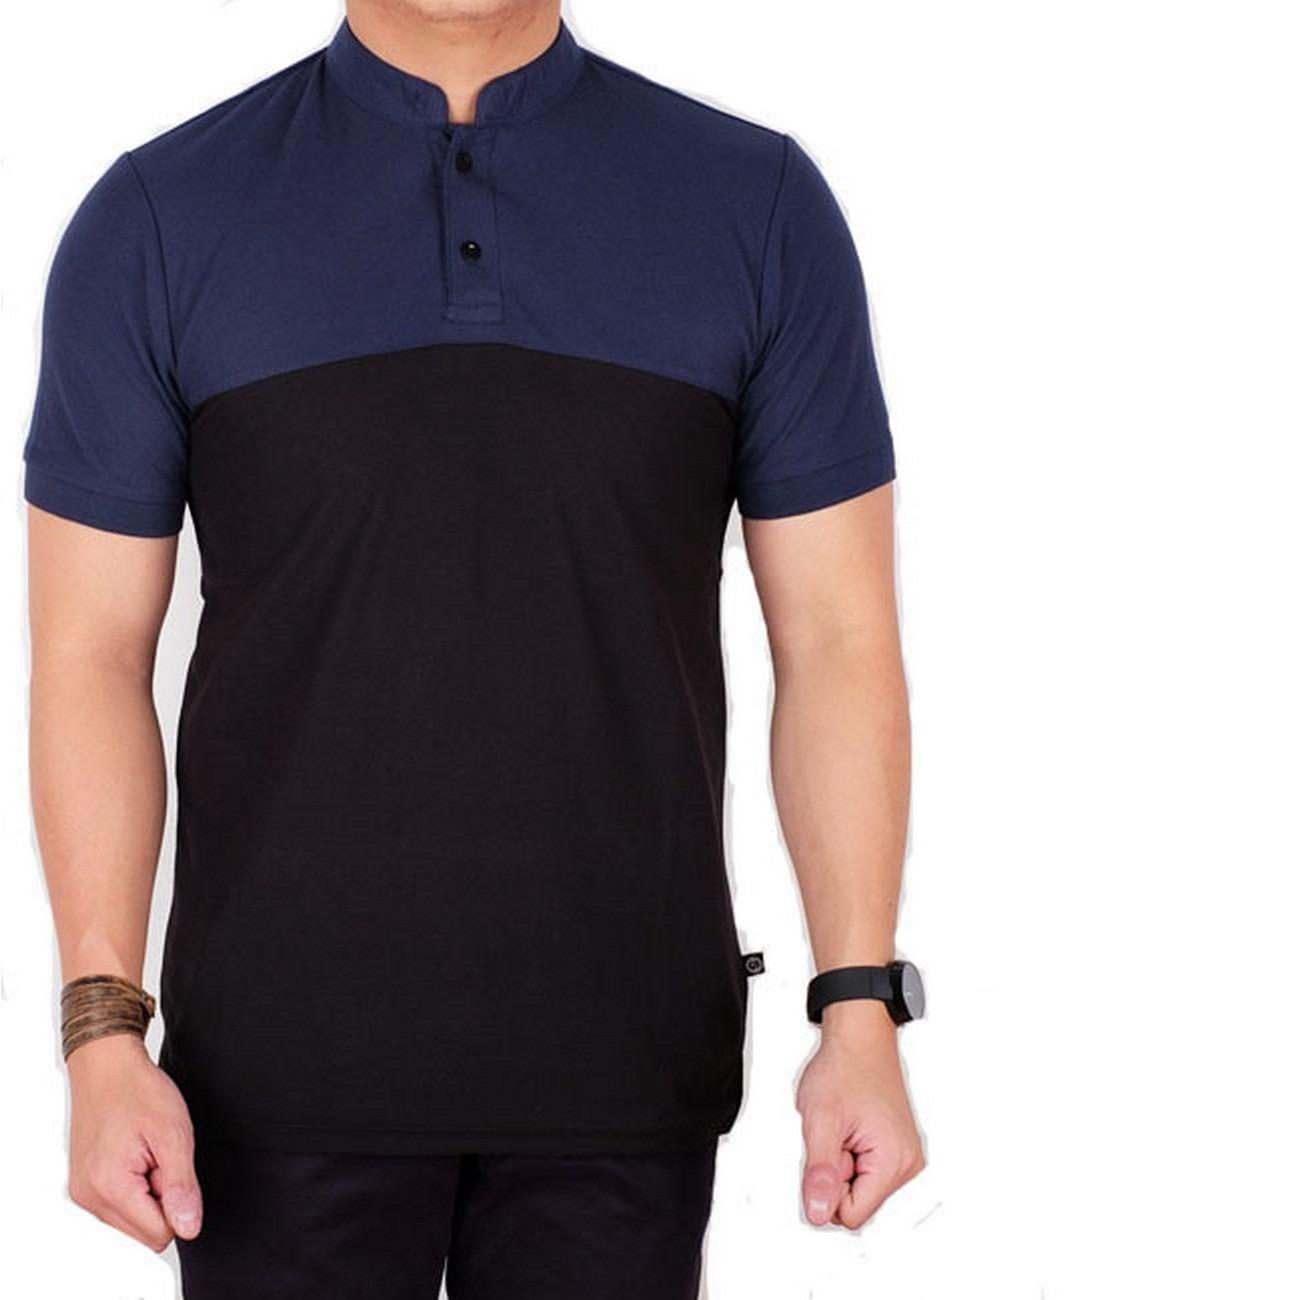 Fitur Shirt Pria Lengan Pendek Putih List Hitam Baju Kaos Polo Kerah Kemeja Polos Kombinasi Navy Sanghai